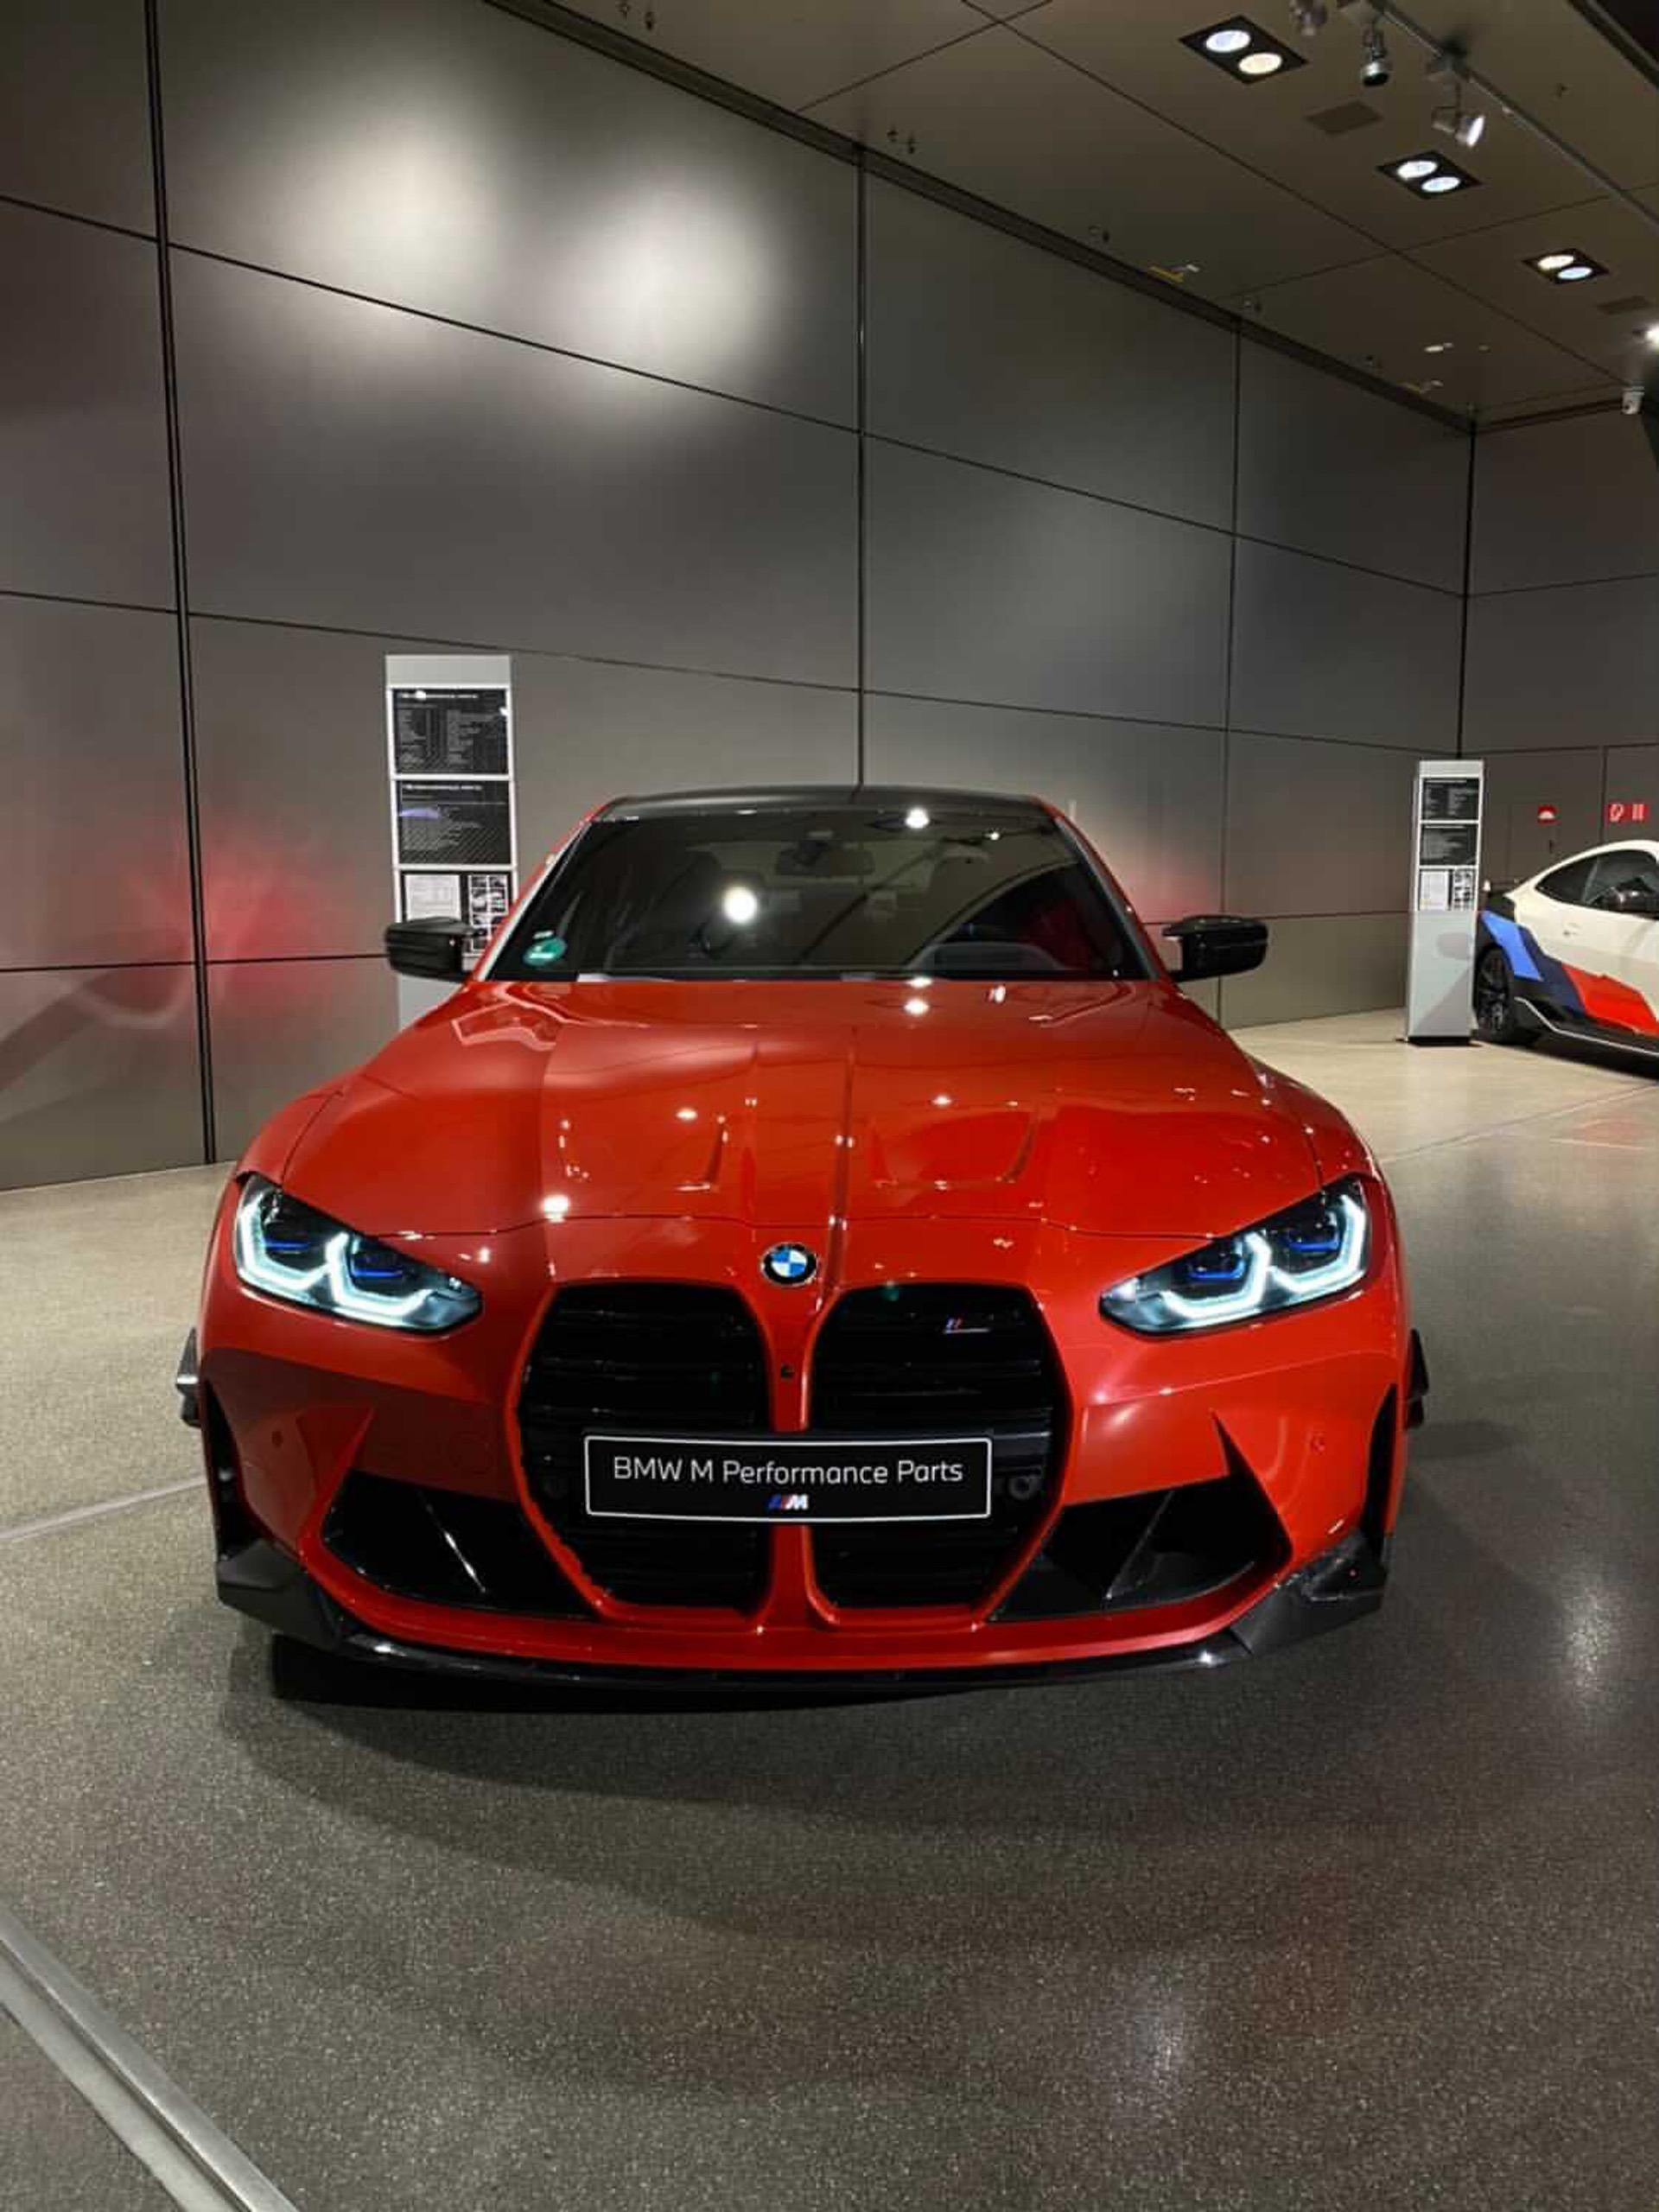 2021 bmw m3 m performance parts red color 06